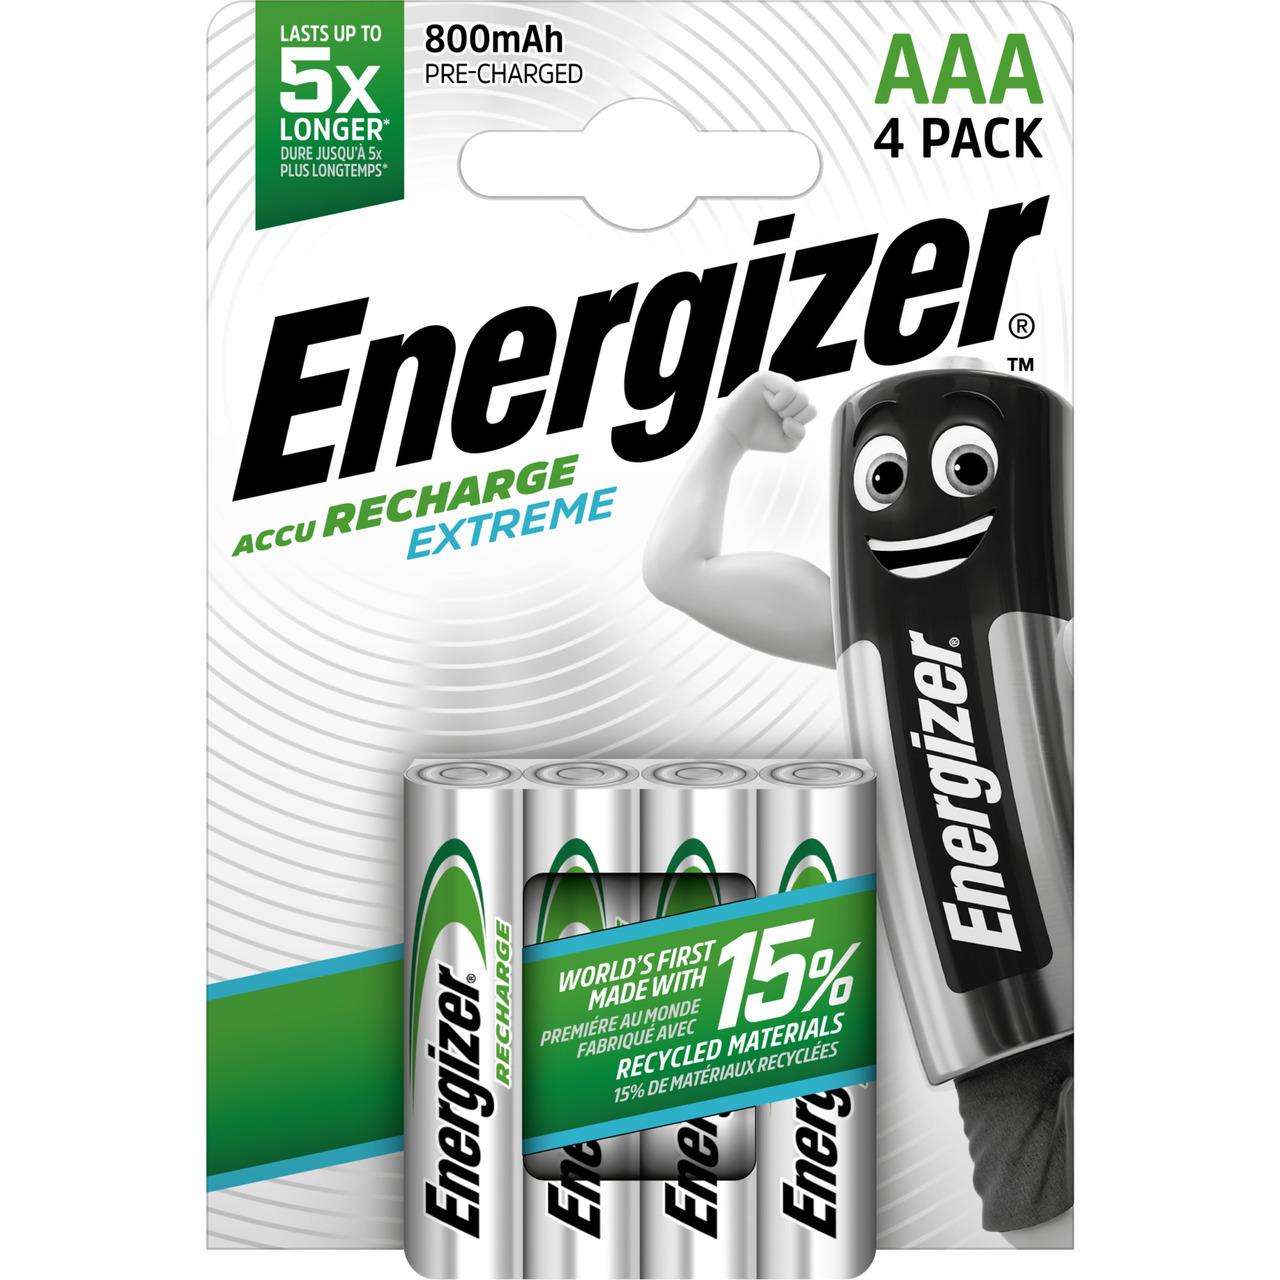 Energizer NiMH-Akku Extreme- Micro 800 mAh- vorgeladen 4er Pack